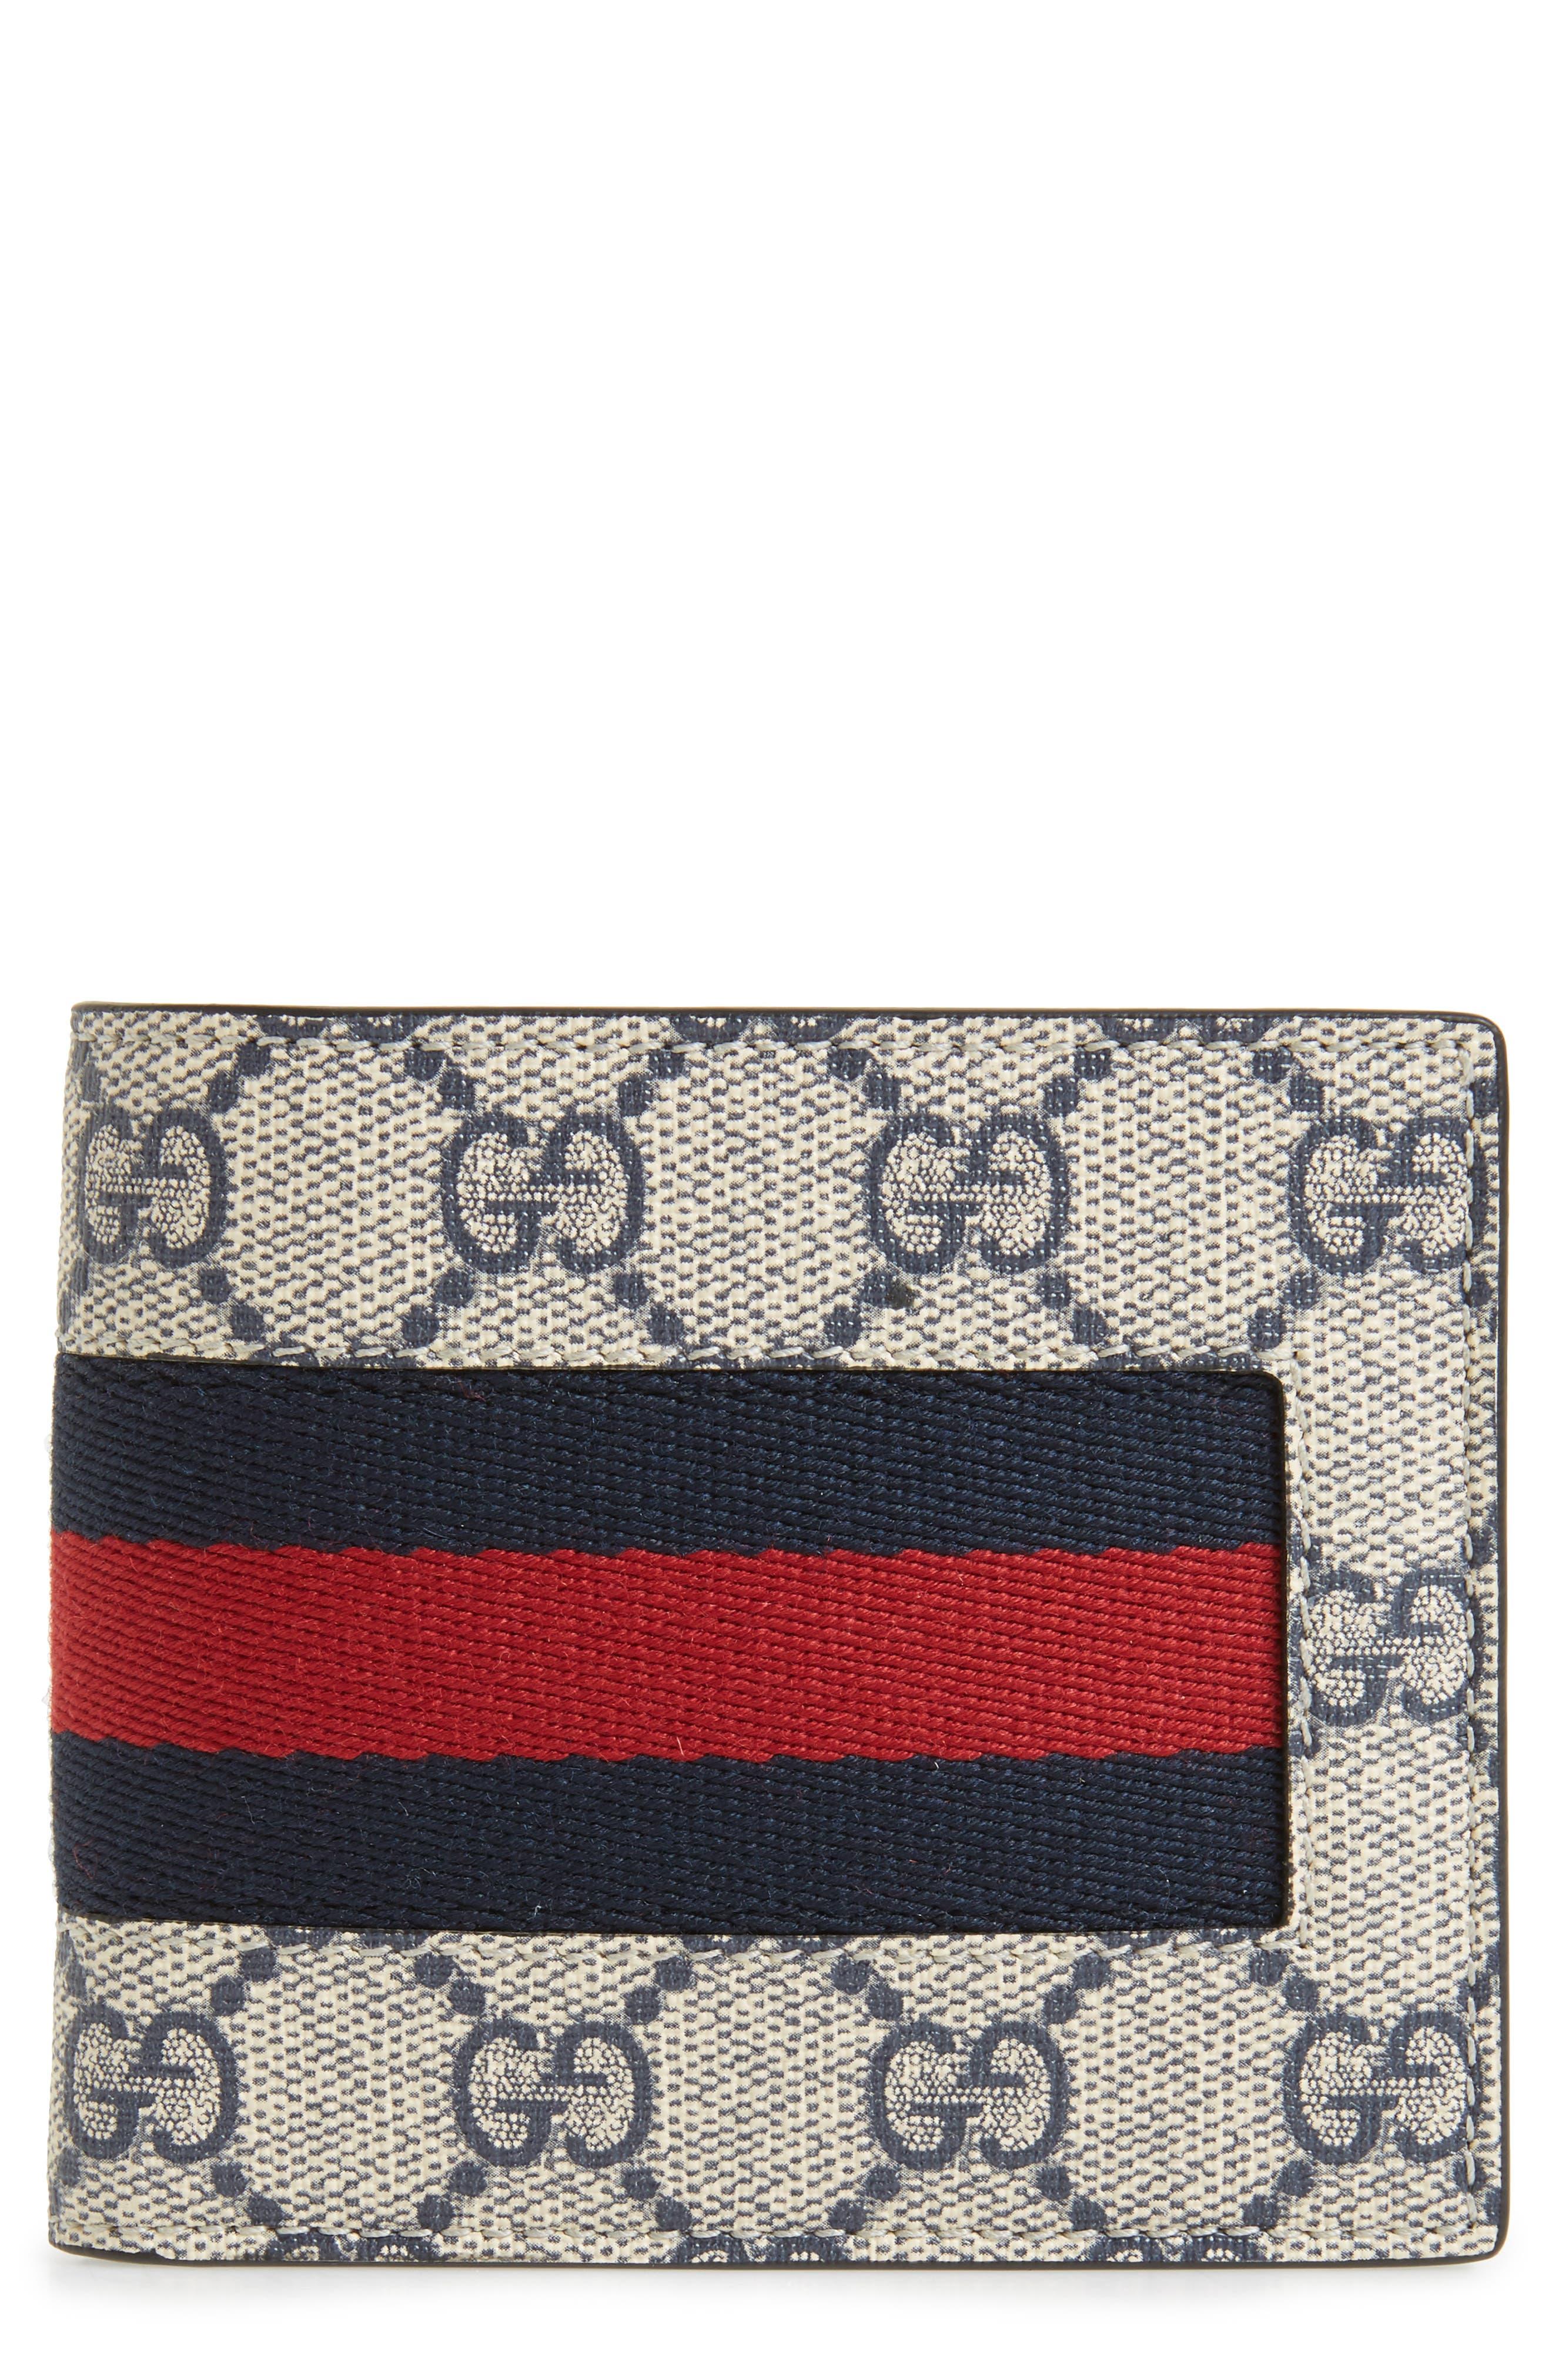 Supreme Wallet,                             Main thumbnail 3, color,